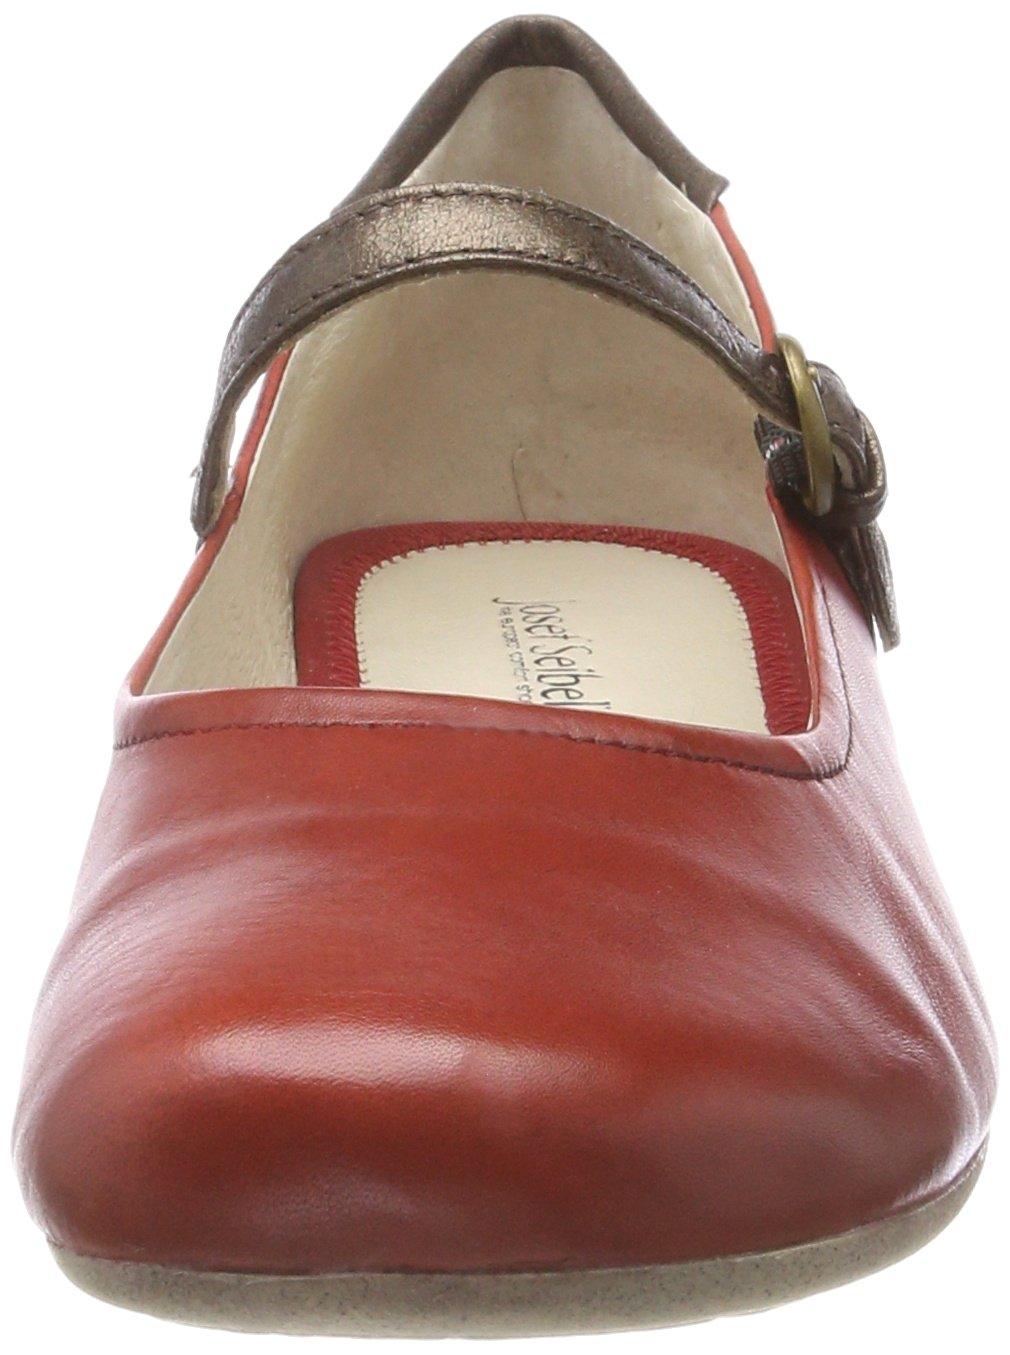 Josef Seibel Damen Fiona 25 (Carmin-kombi) Geschlossene Ballerinas Rot (Carmin-kombi) 25 2b8f85